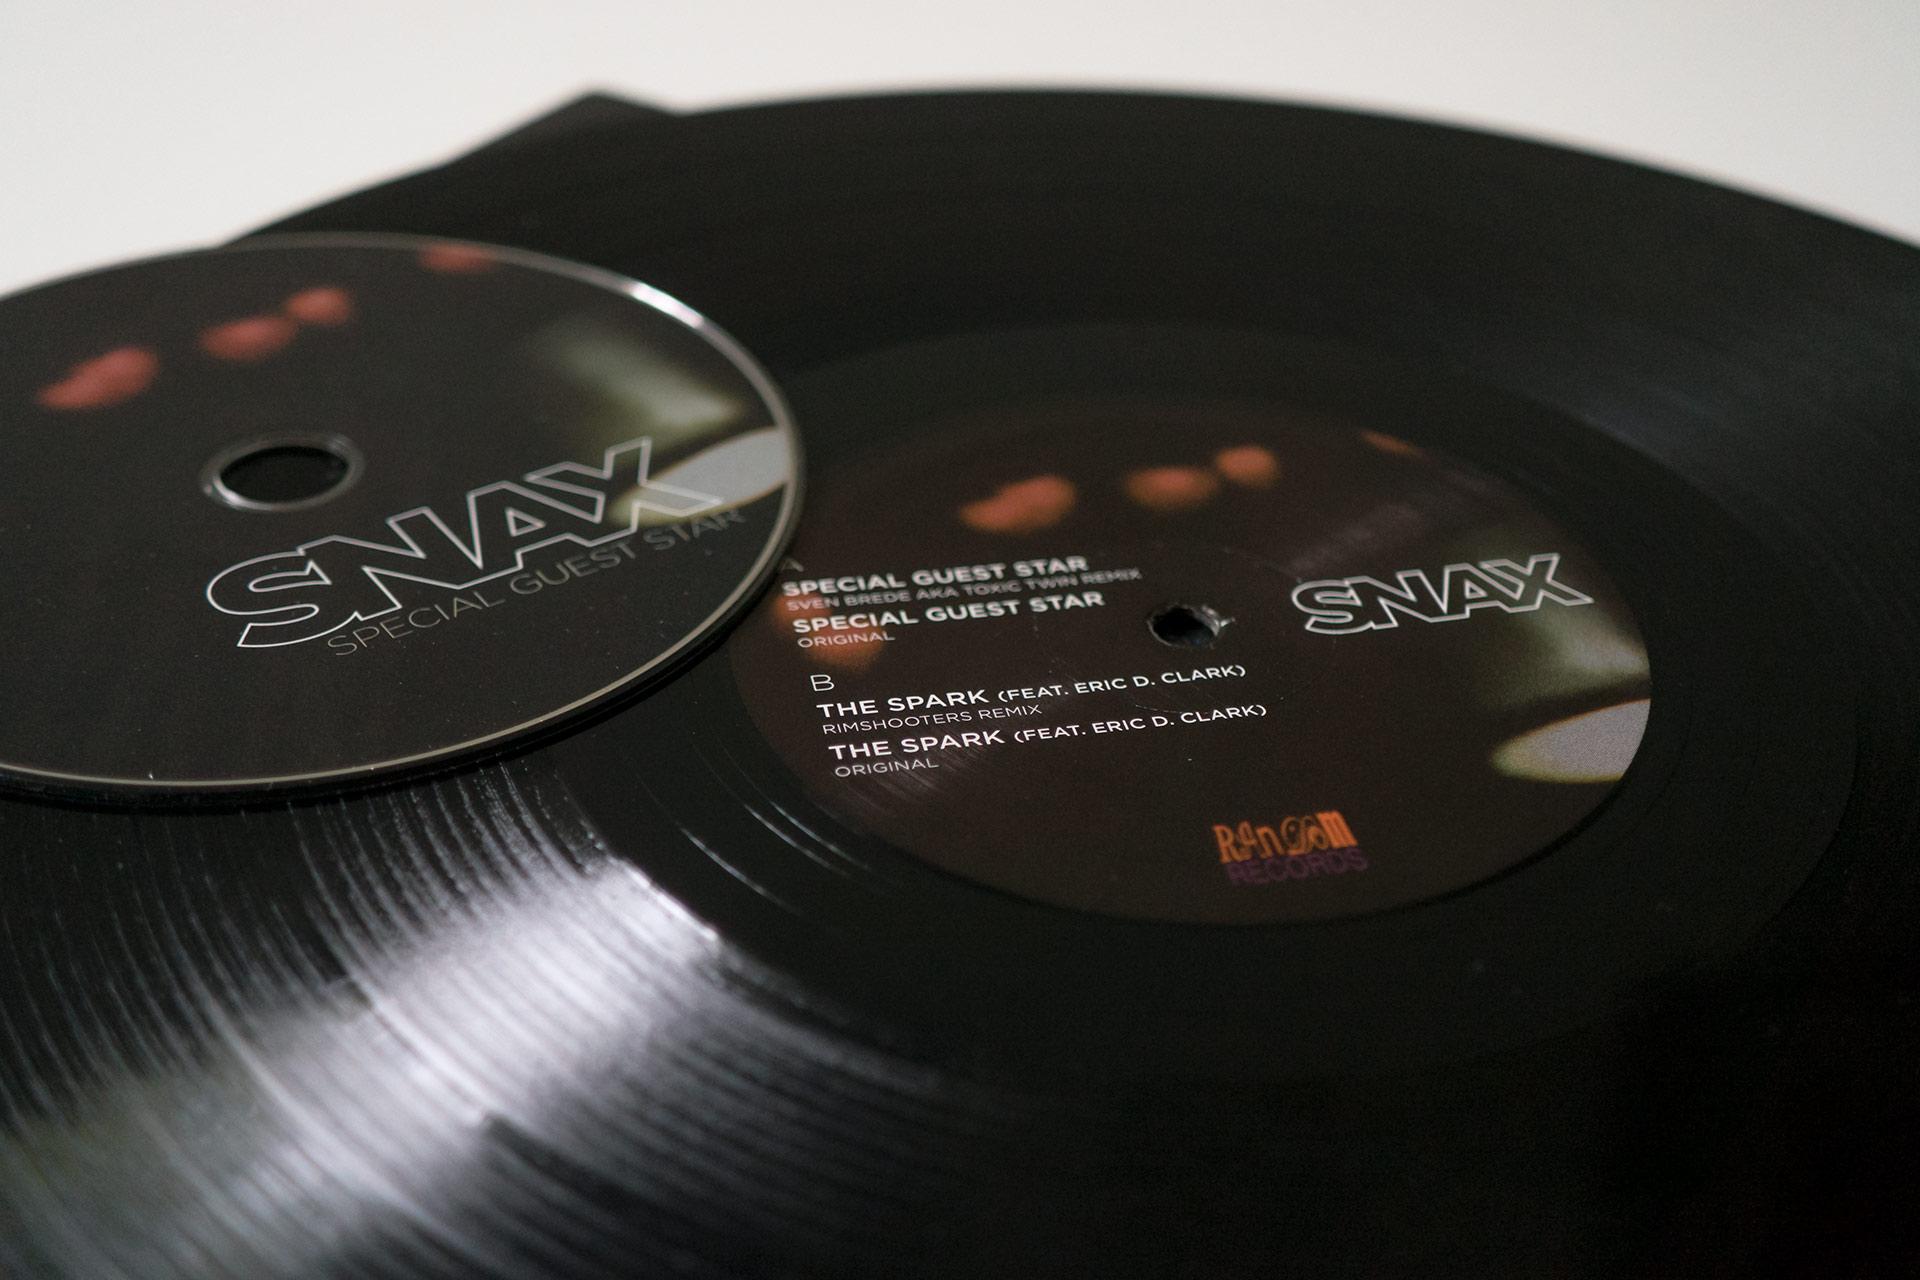 Mario Dzurila LP Vinyl Cover Design Snax Special Guest Star